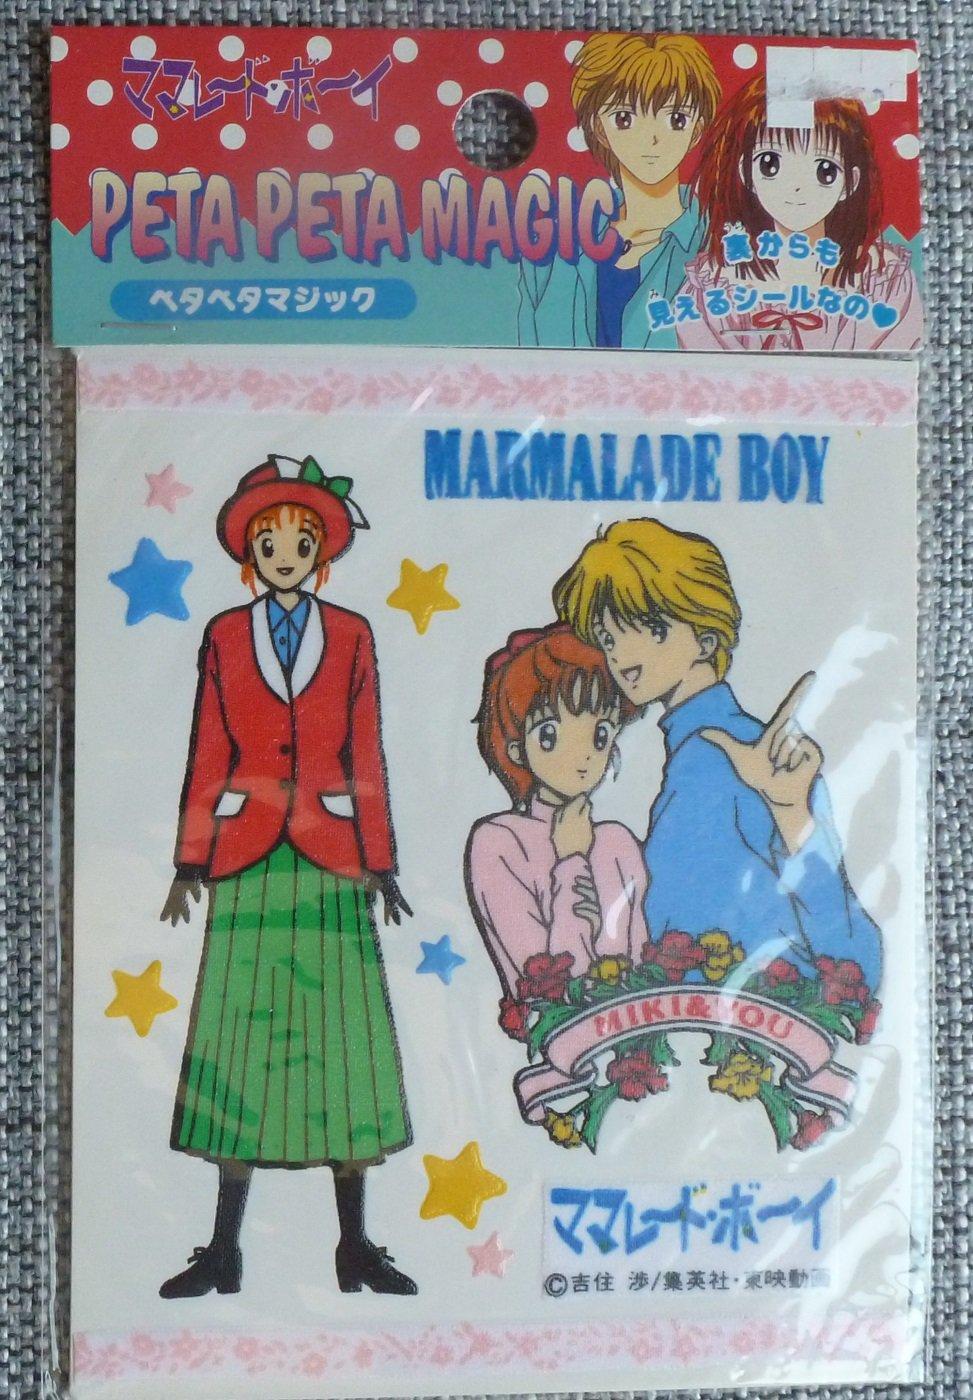 Marmalade Boy Stickers Peta Peta Magic Plastic Wataru Yoshizumi 1995 MB Miki Yuu Ginta